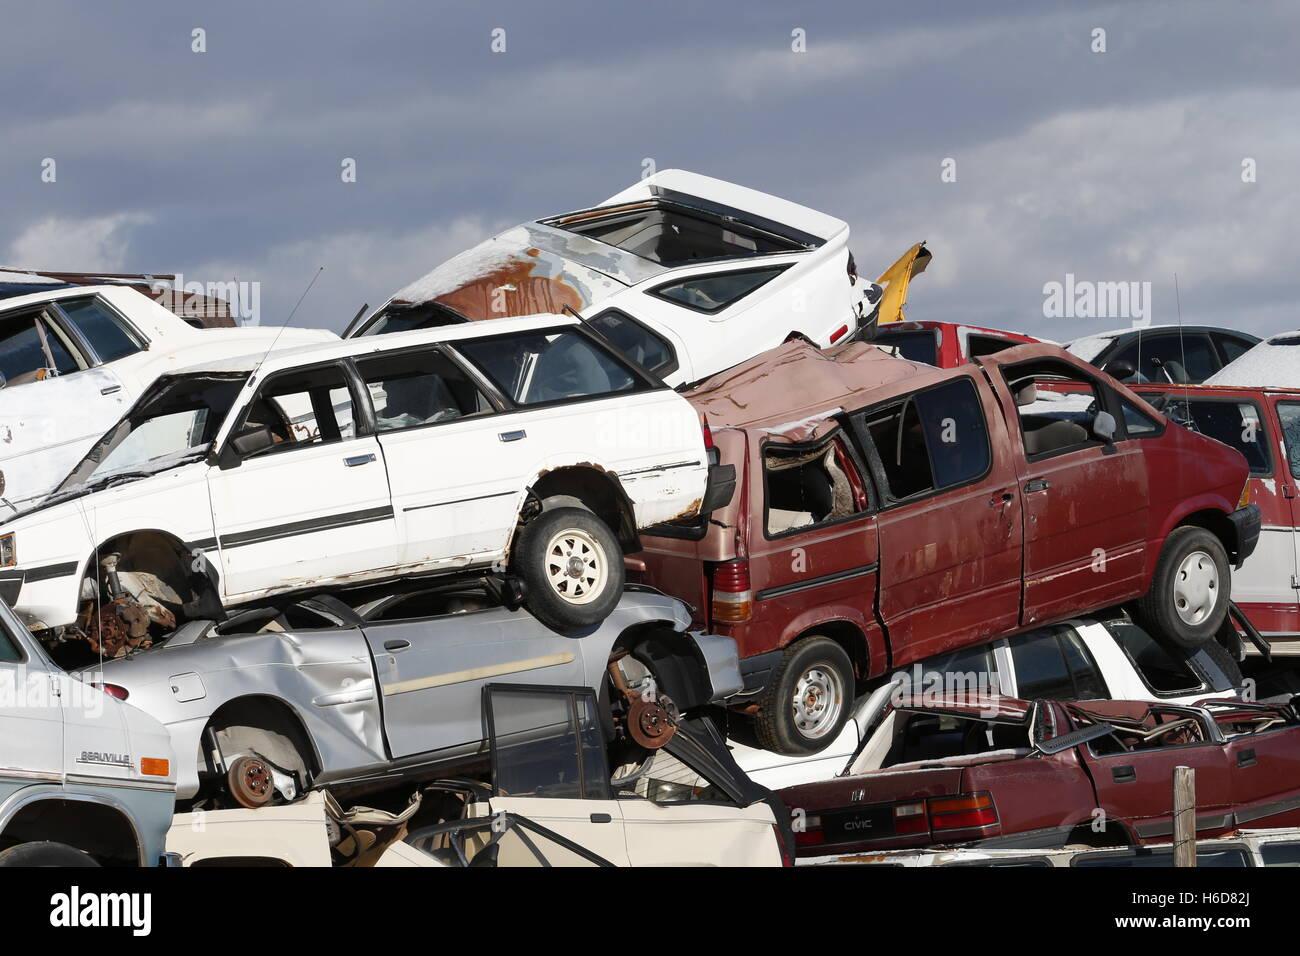 Auto junkyard - Stock Image